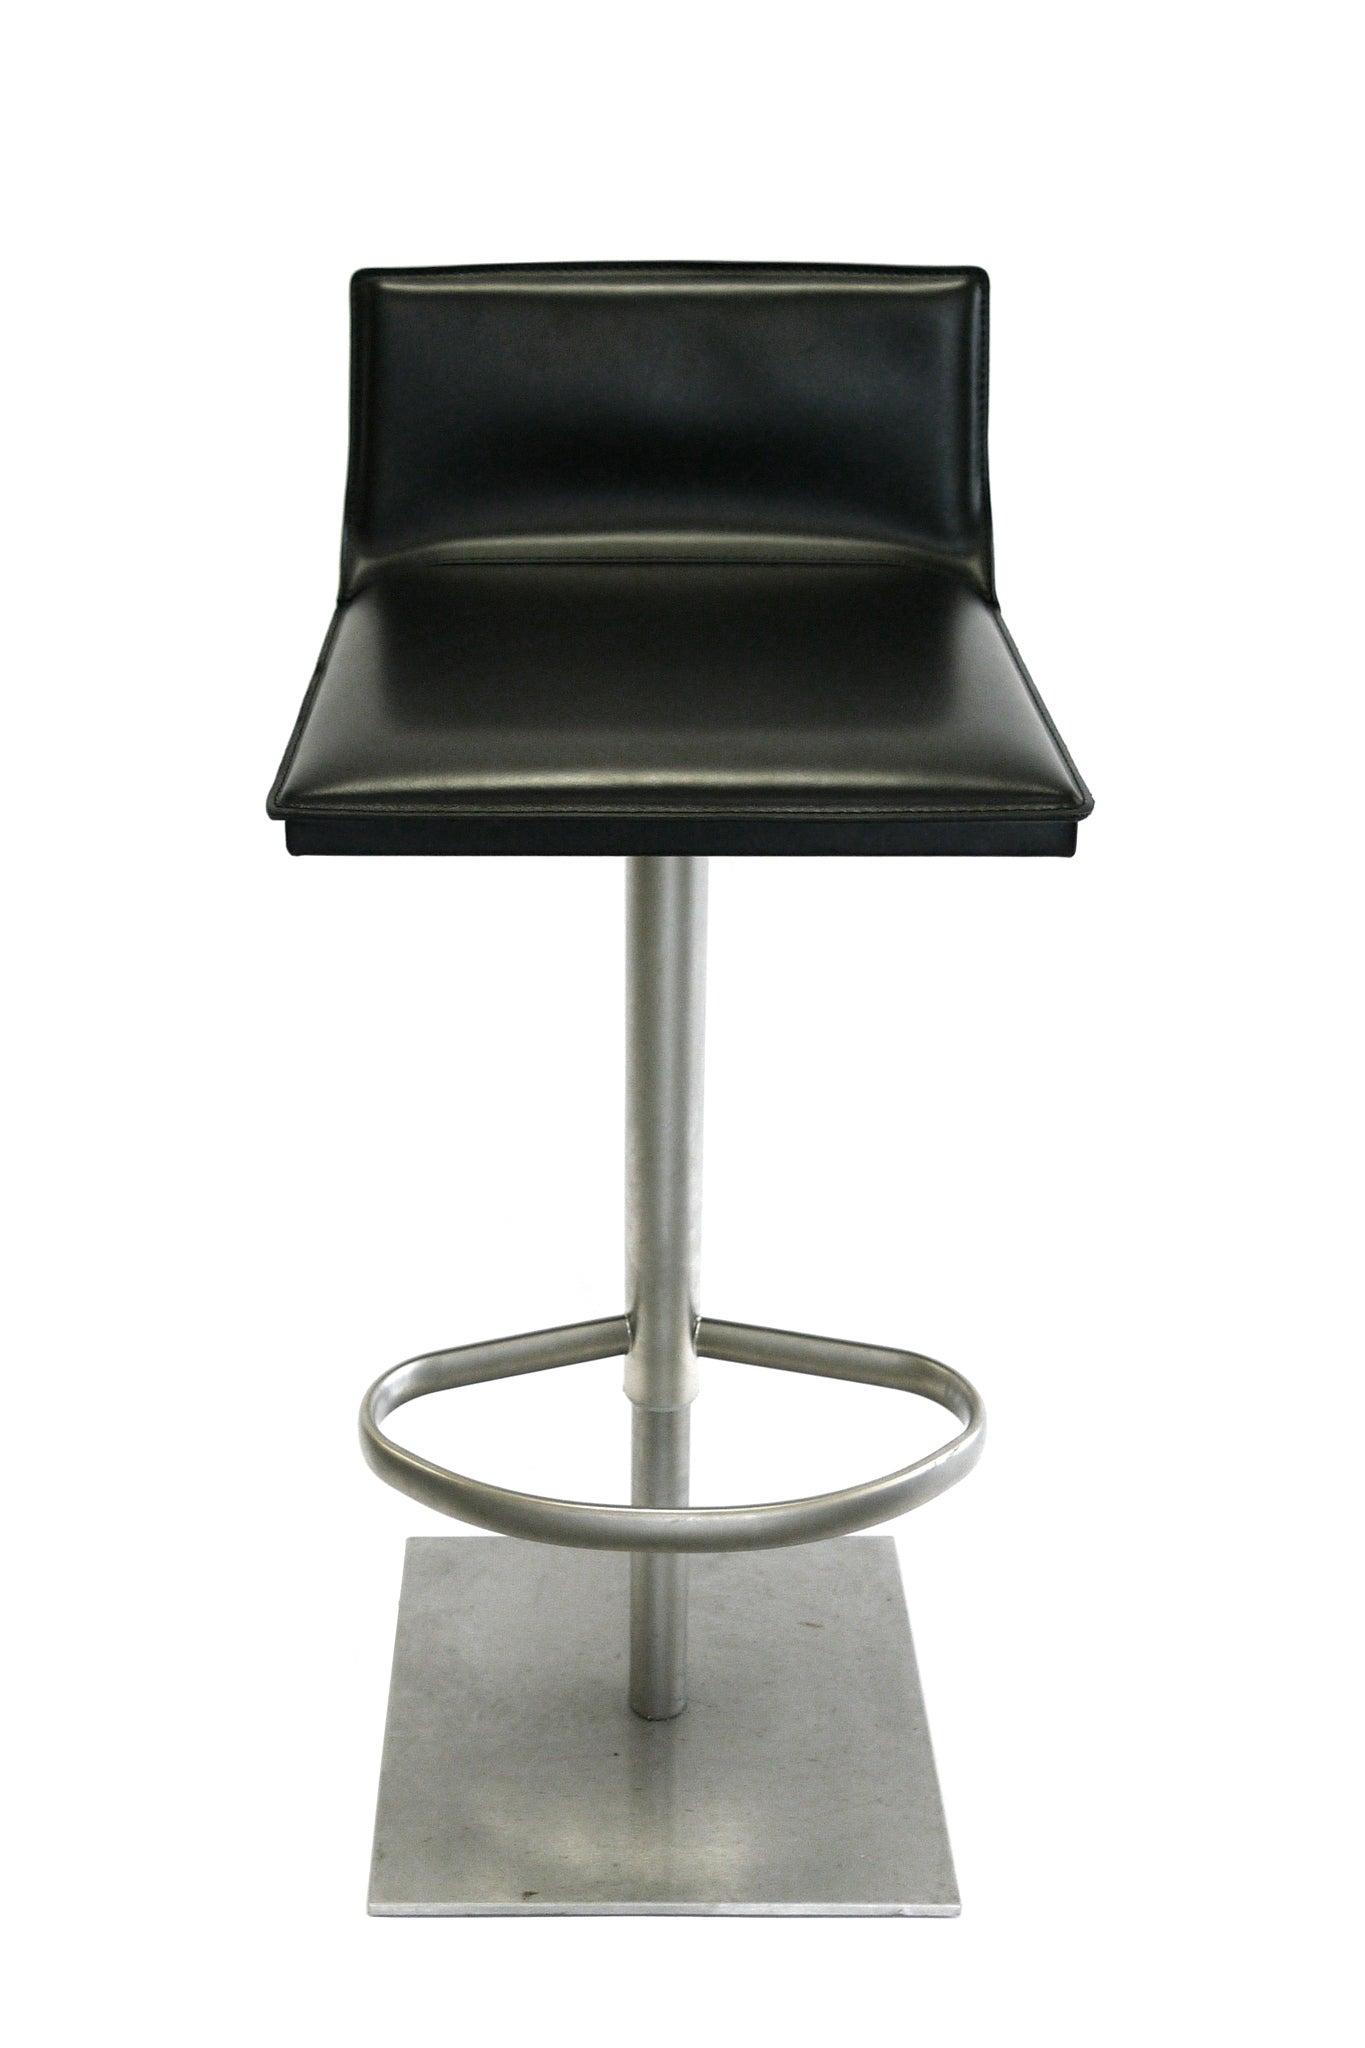 Peachy Italian Leather And Steel Height Adjustable Bar Stool By Camellatalisay Diy Chair Ideas Camellatalisaycom